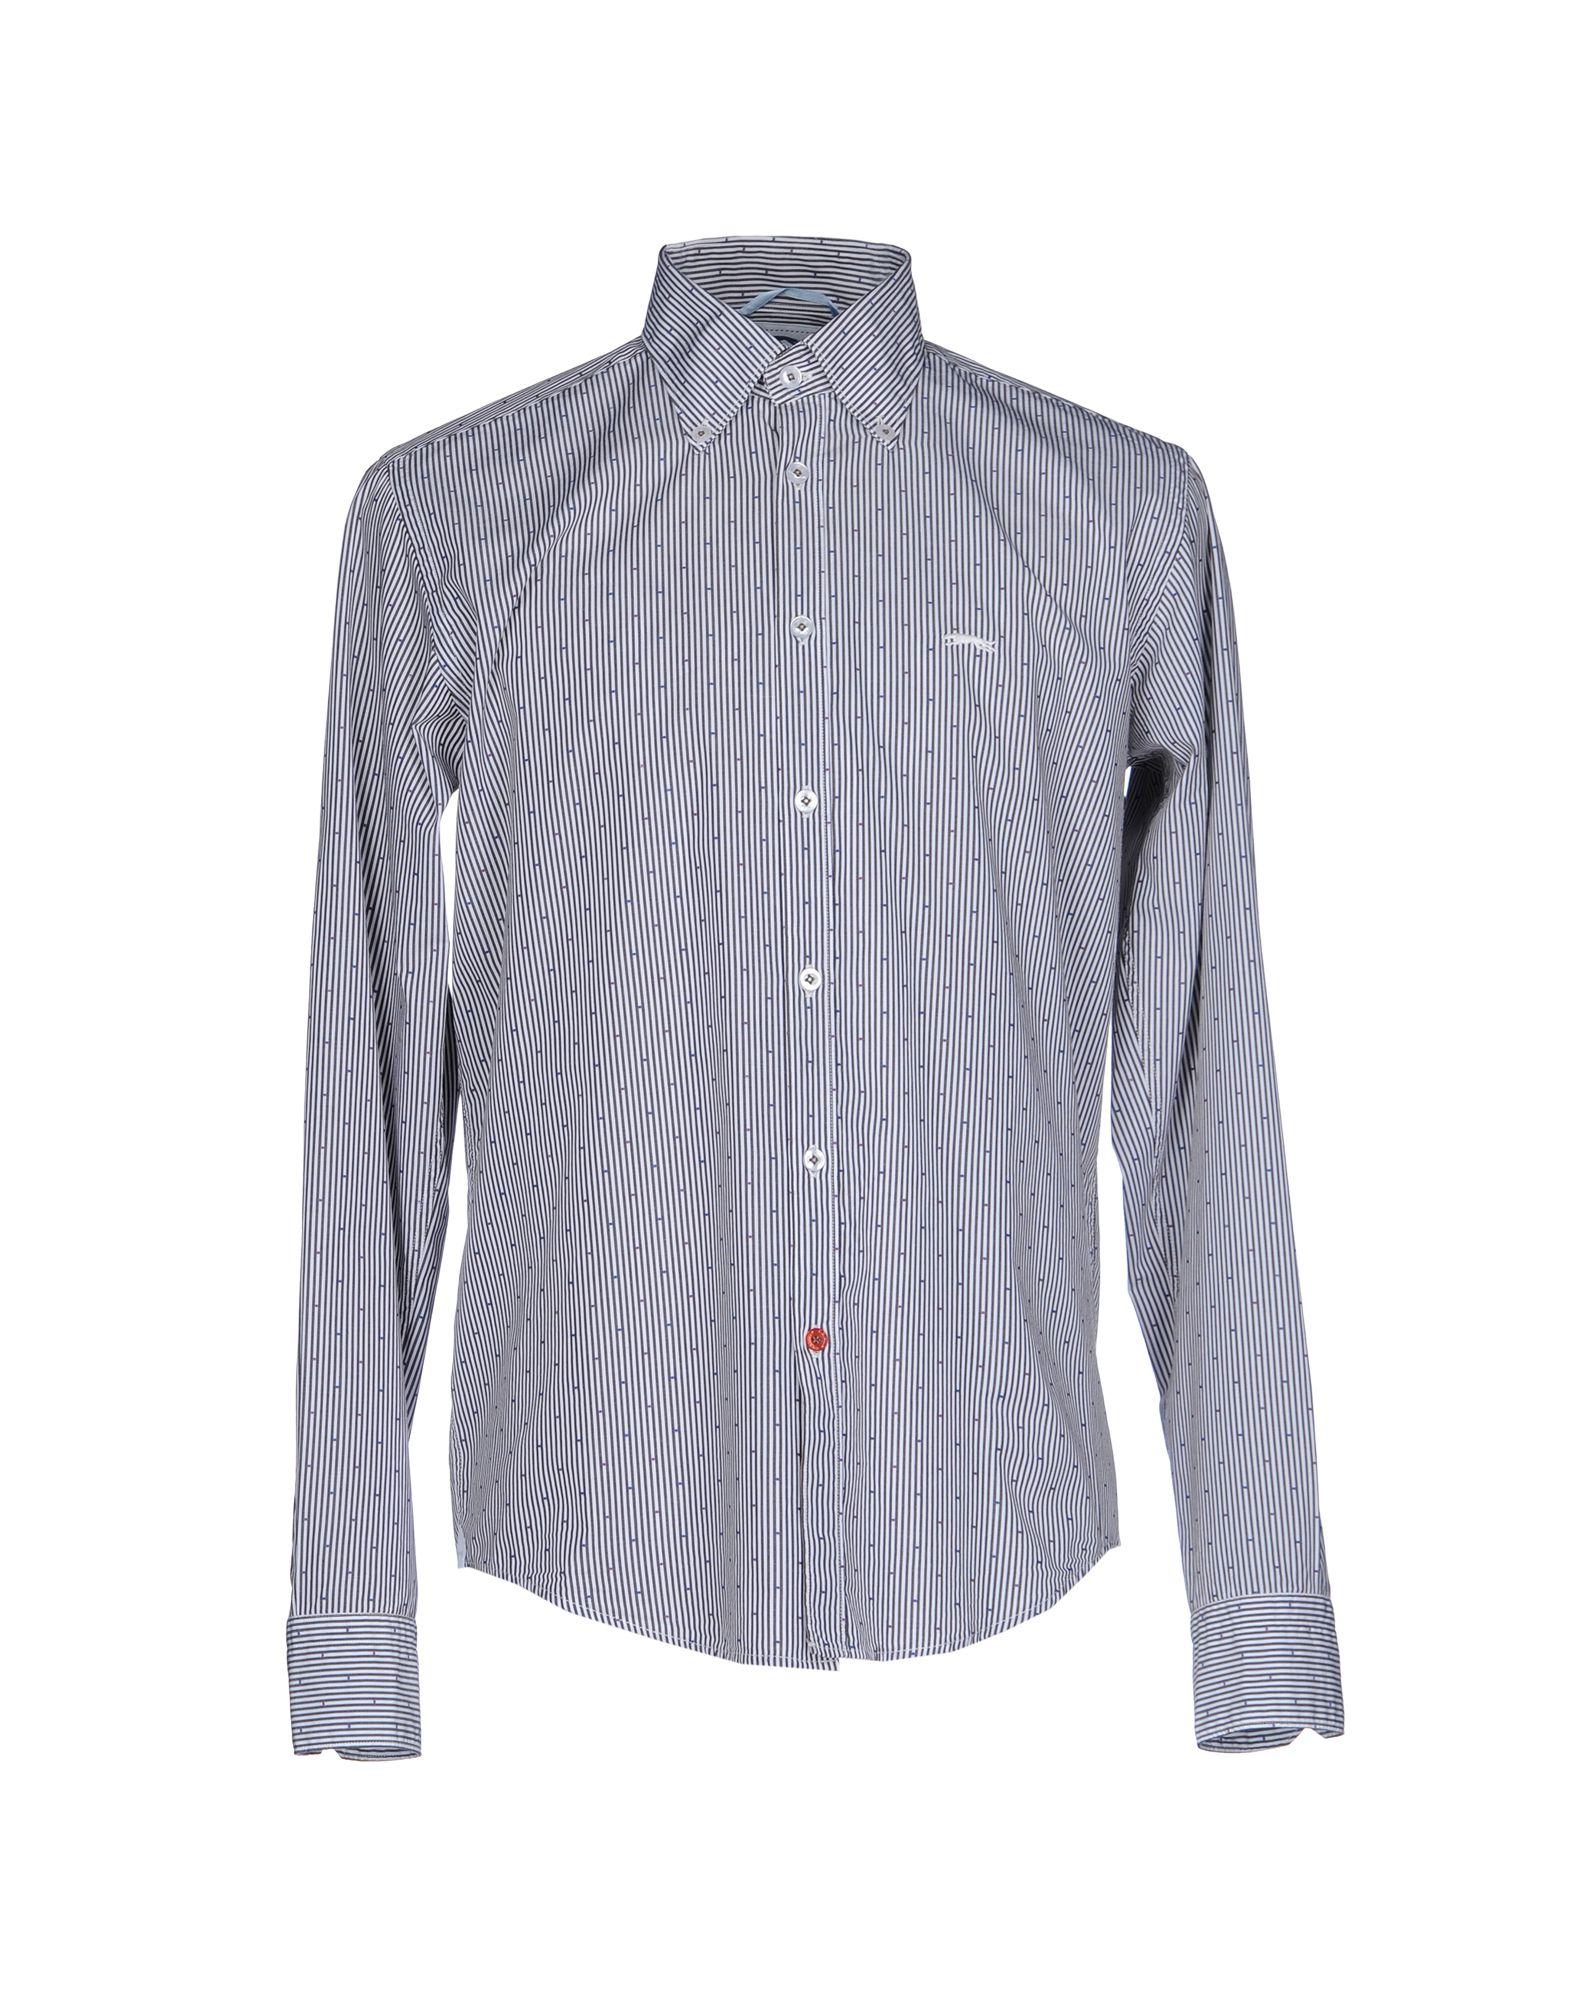 ERA Striped Shirt in Steel Grey